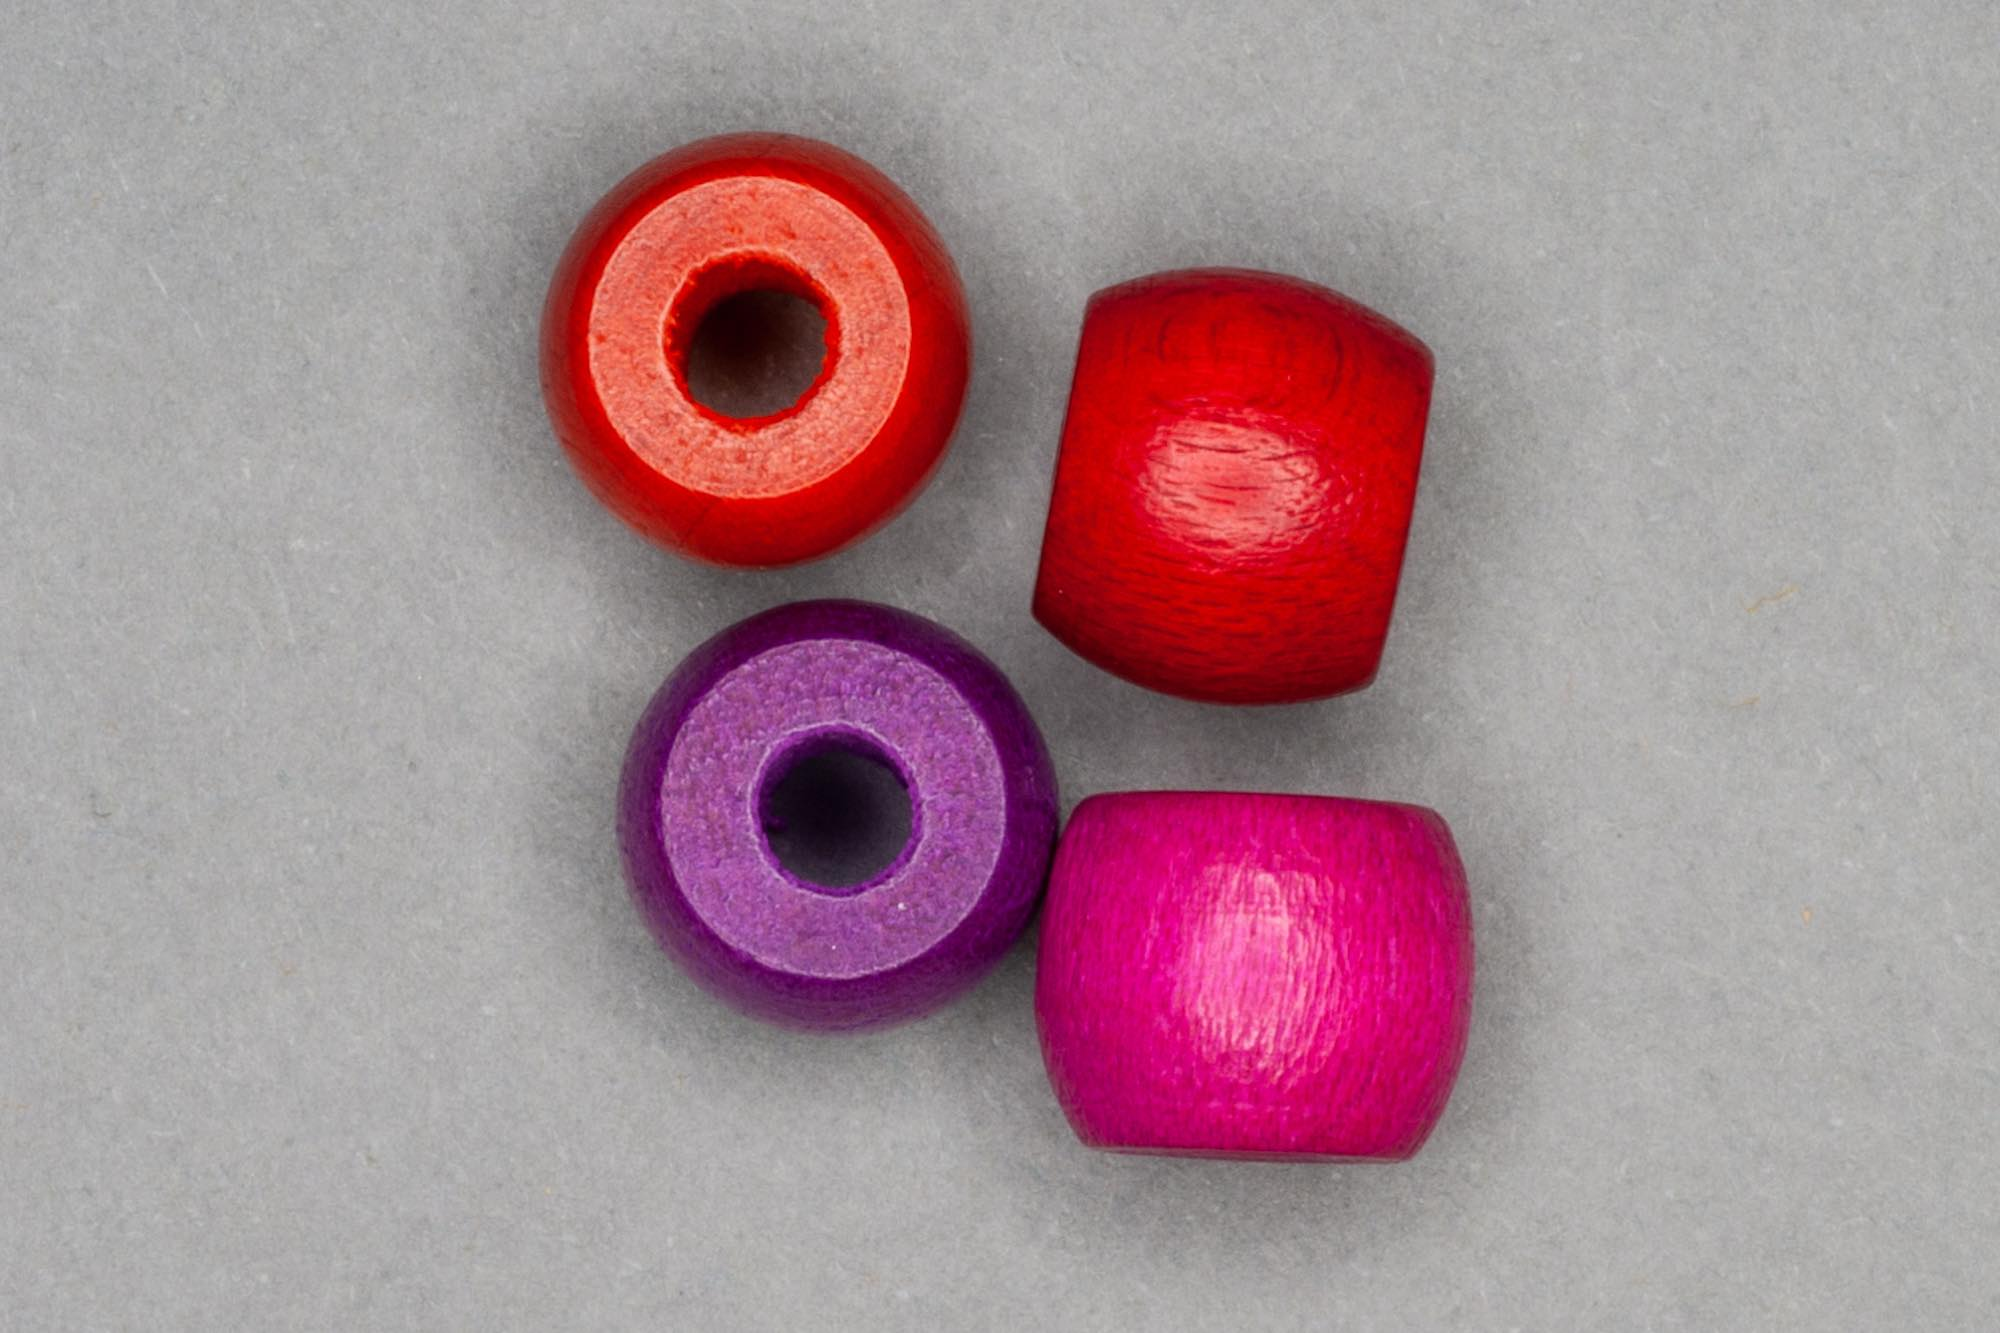 Barrel Wooden Beads 9x8mm, 3mm hole